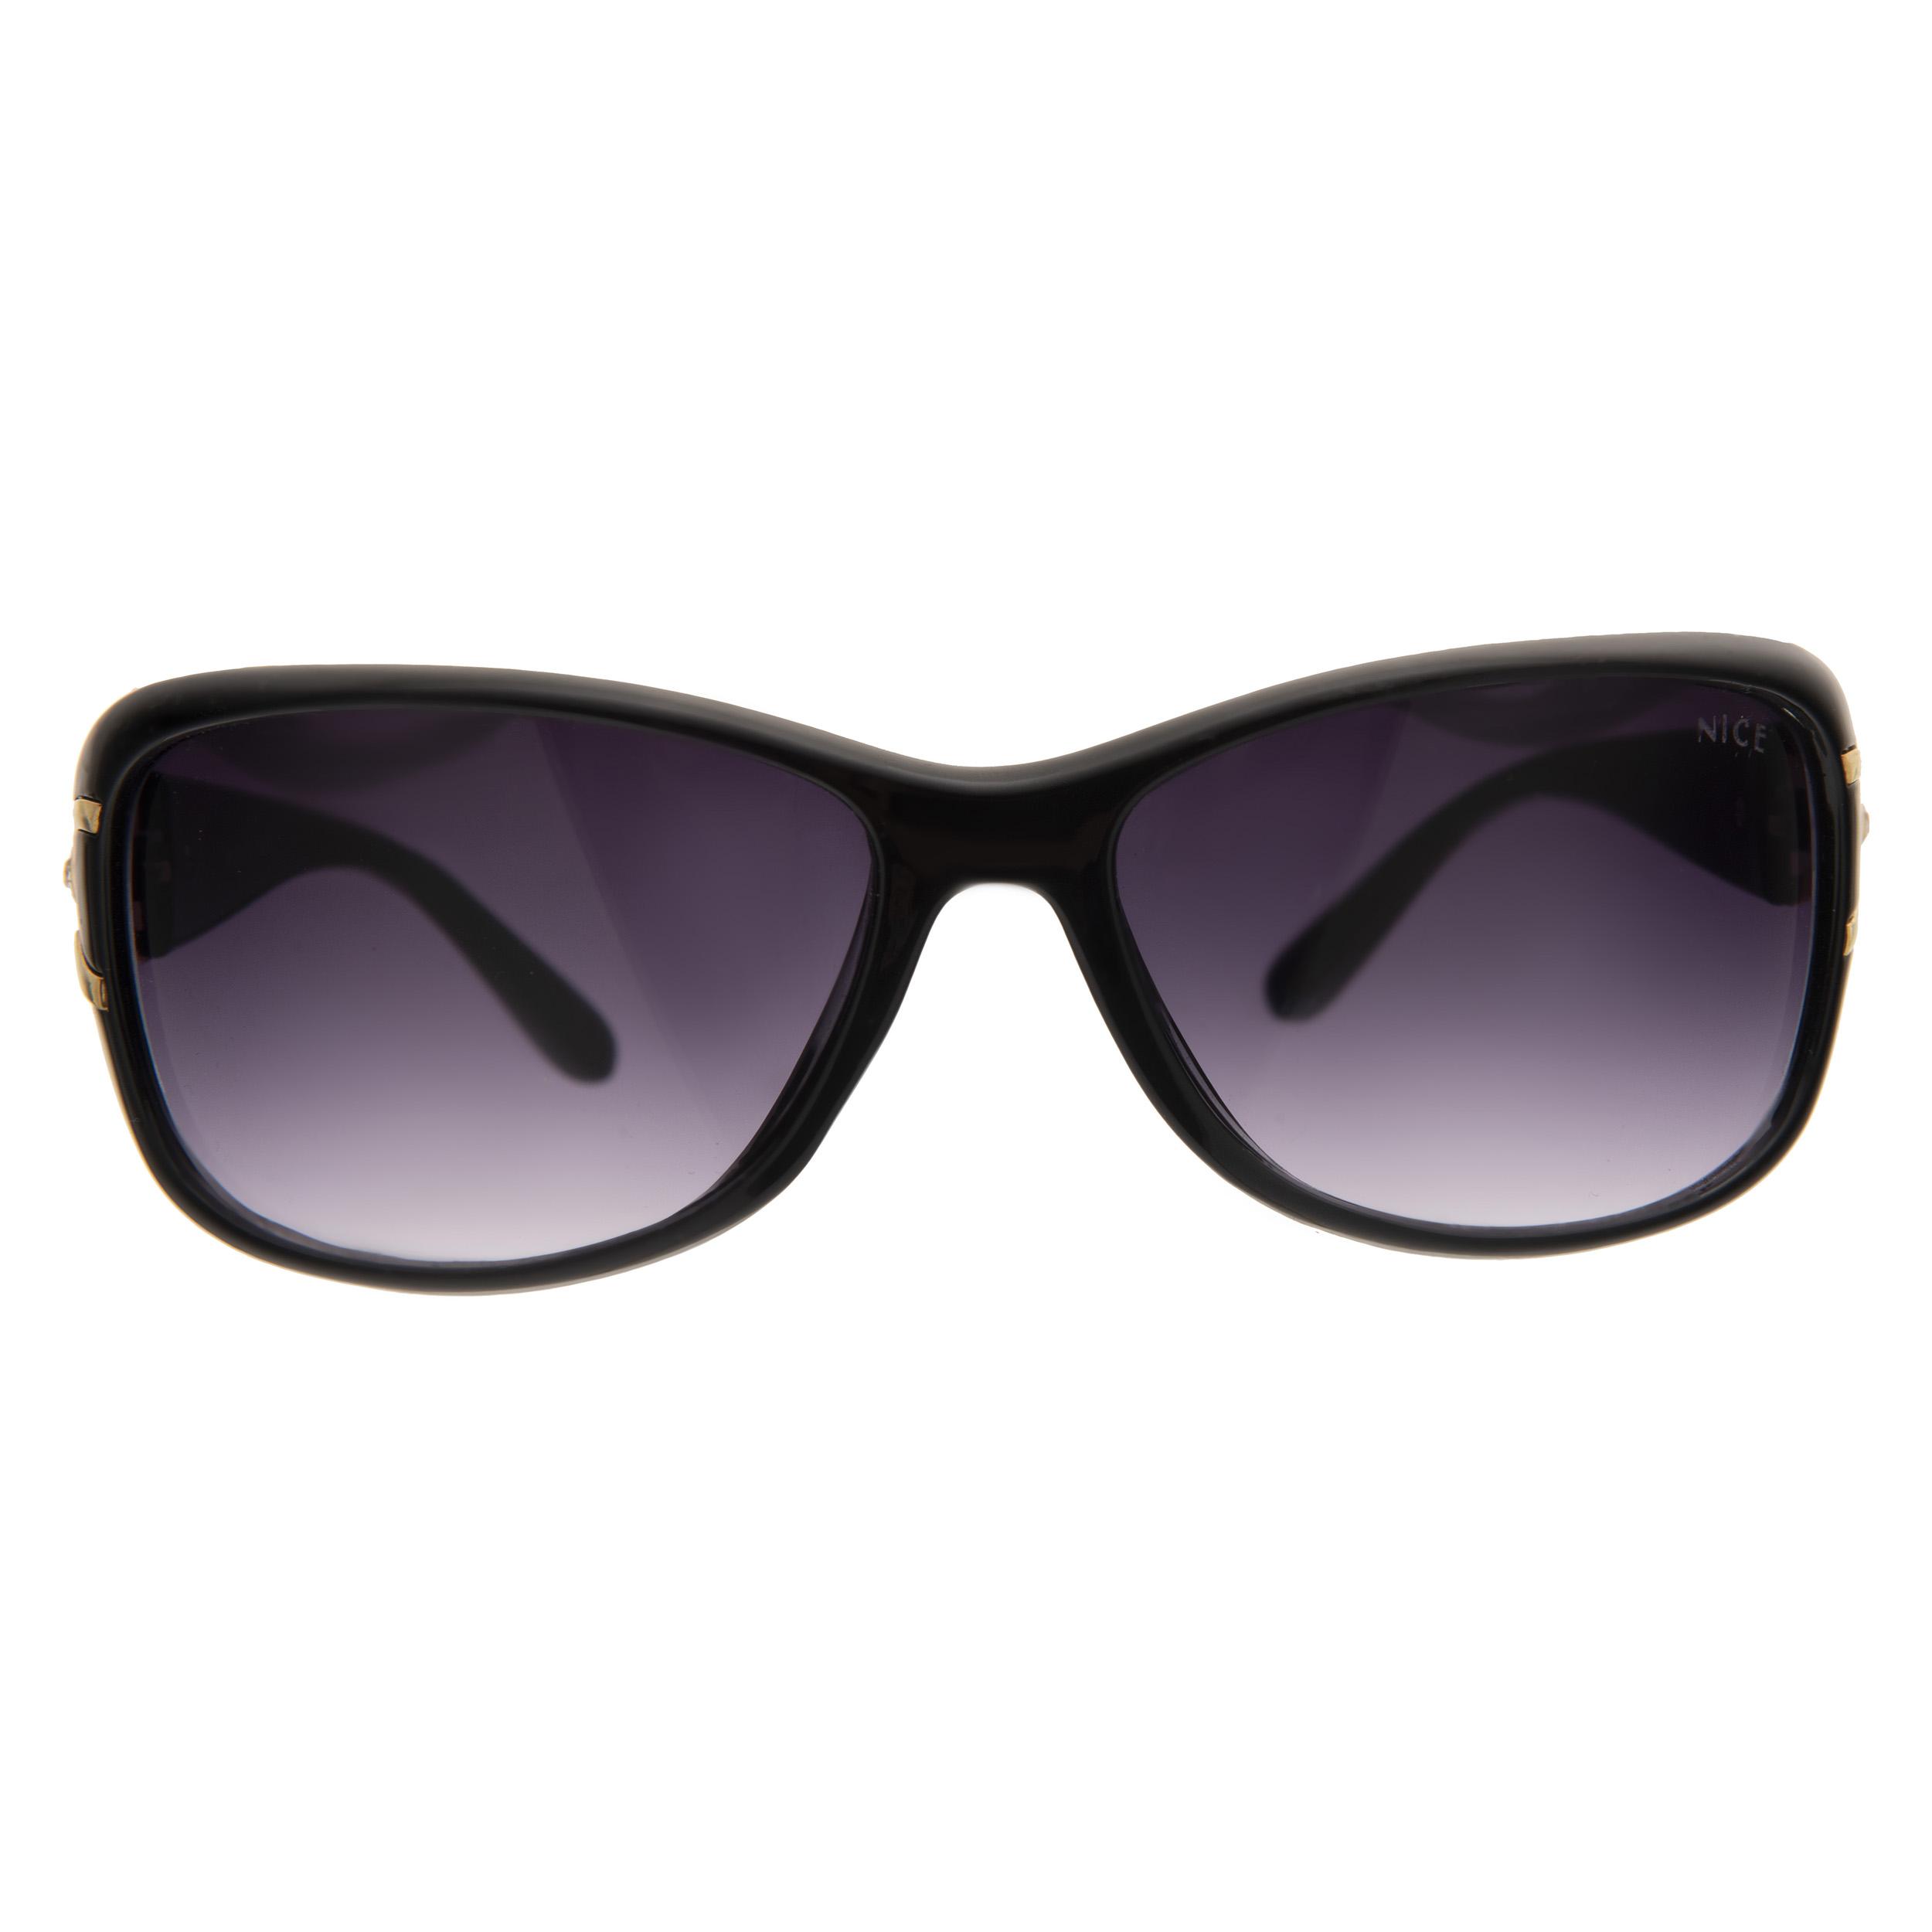 عینک آفتابی مدل Alunix B18